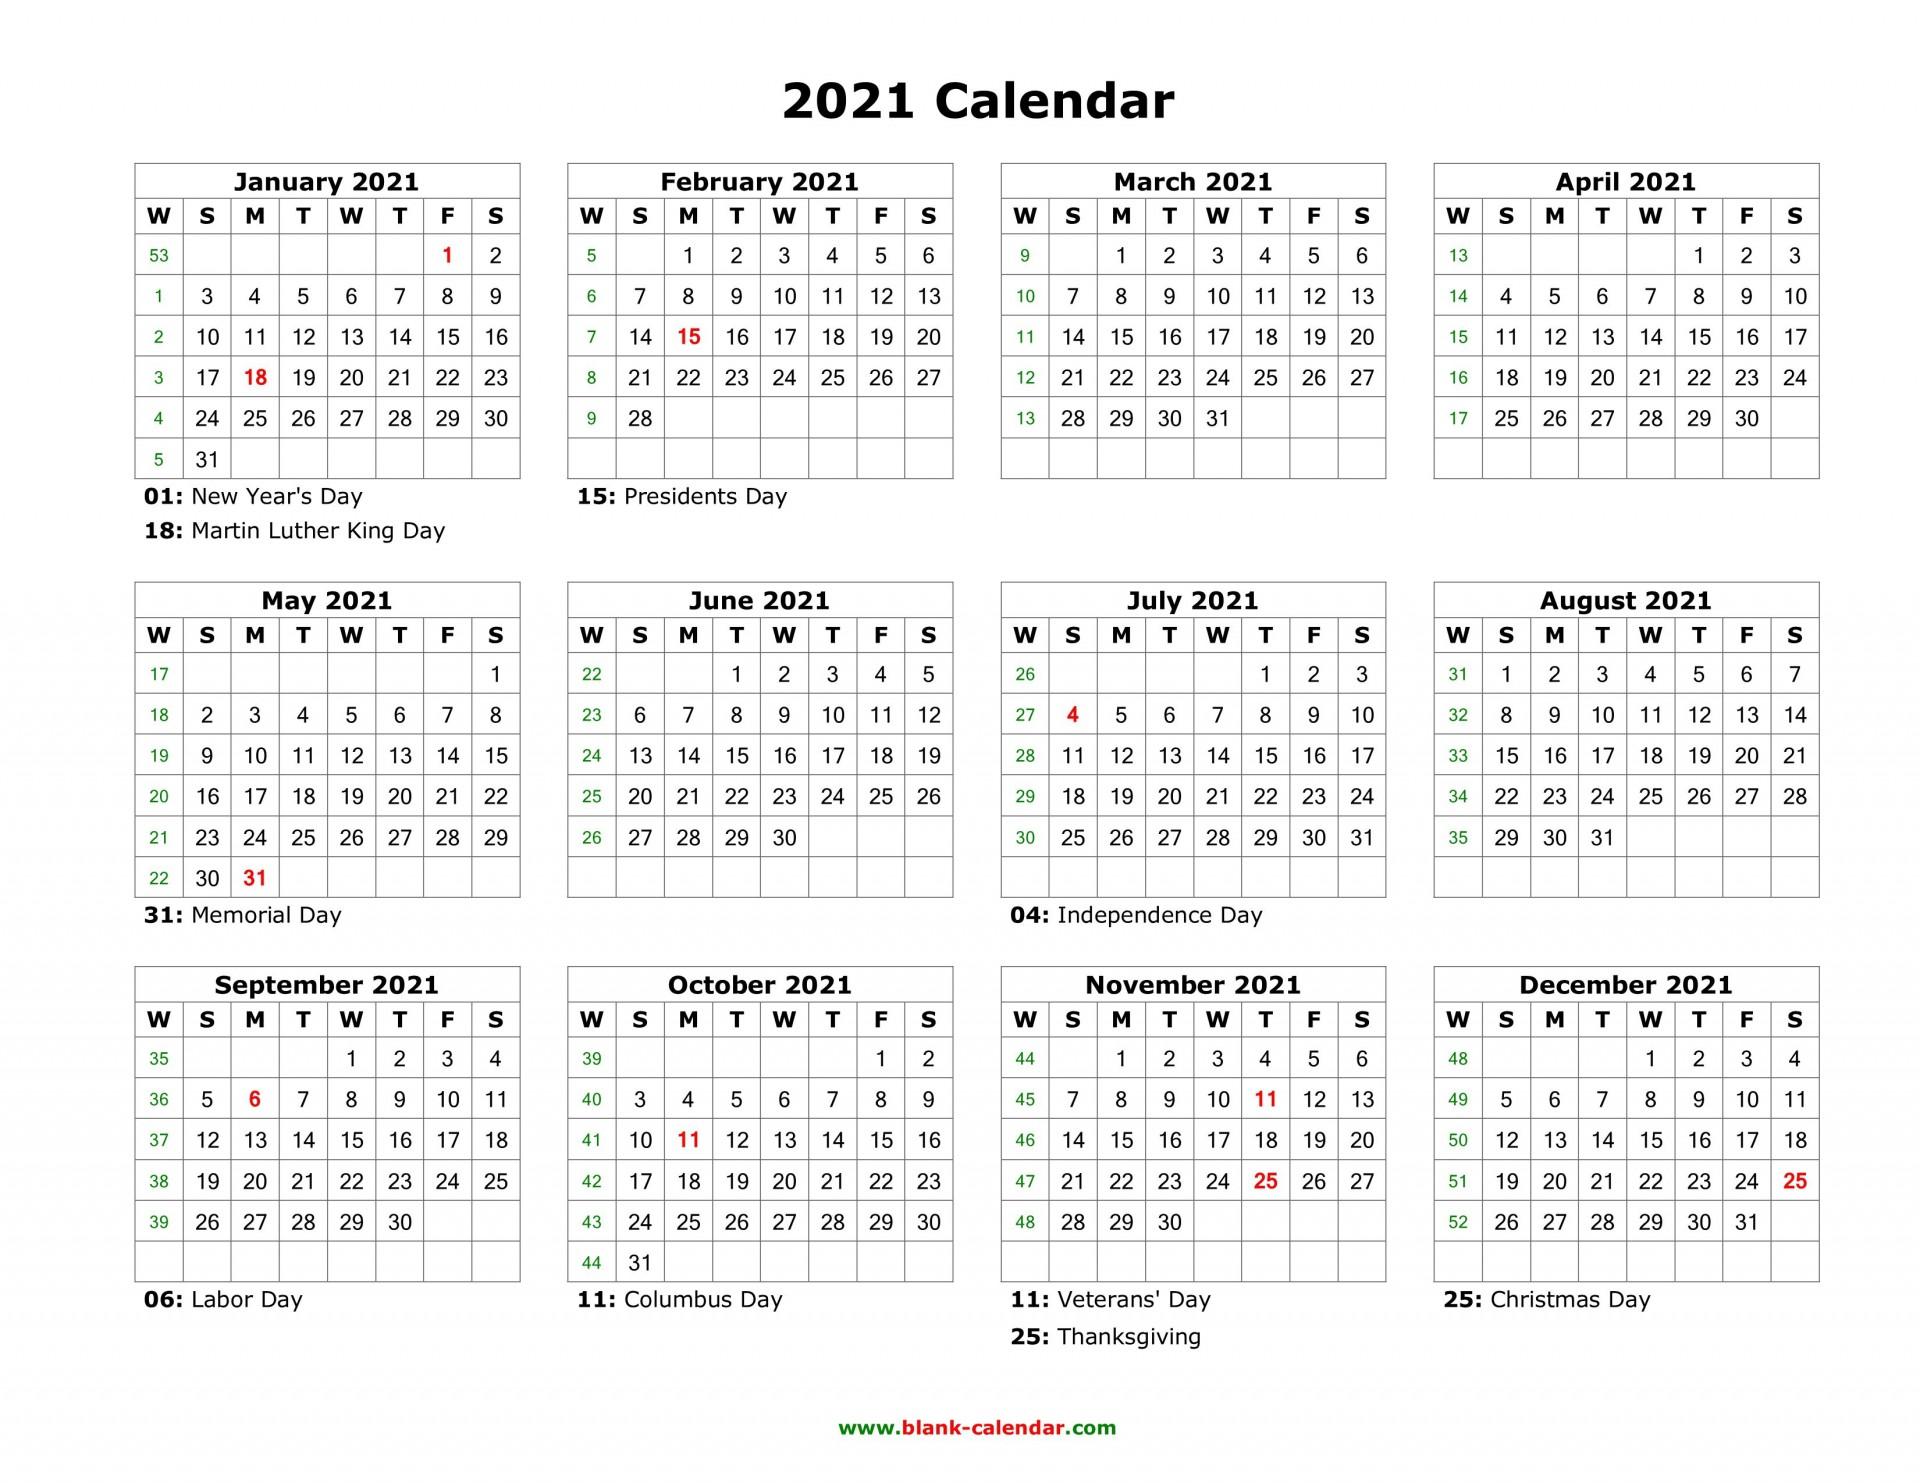 008 Stupendou Google Doc Weekly Calendar Template 2021 High Definition  Free1920